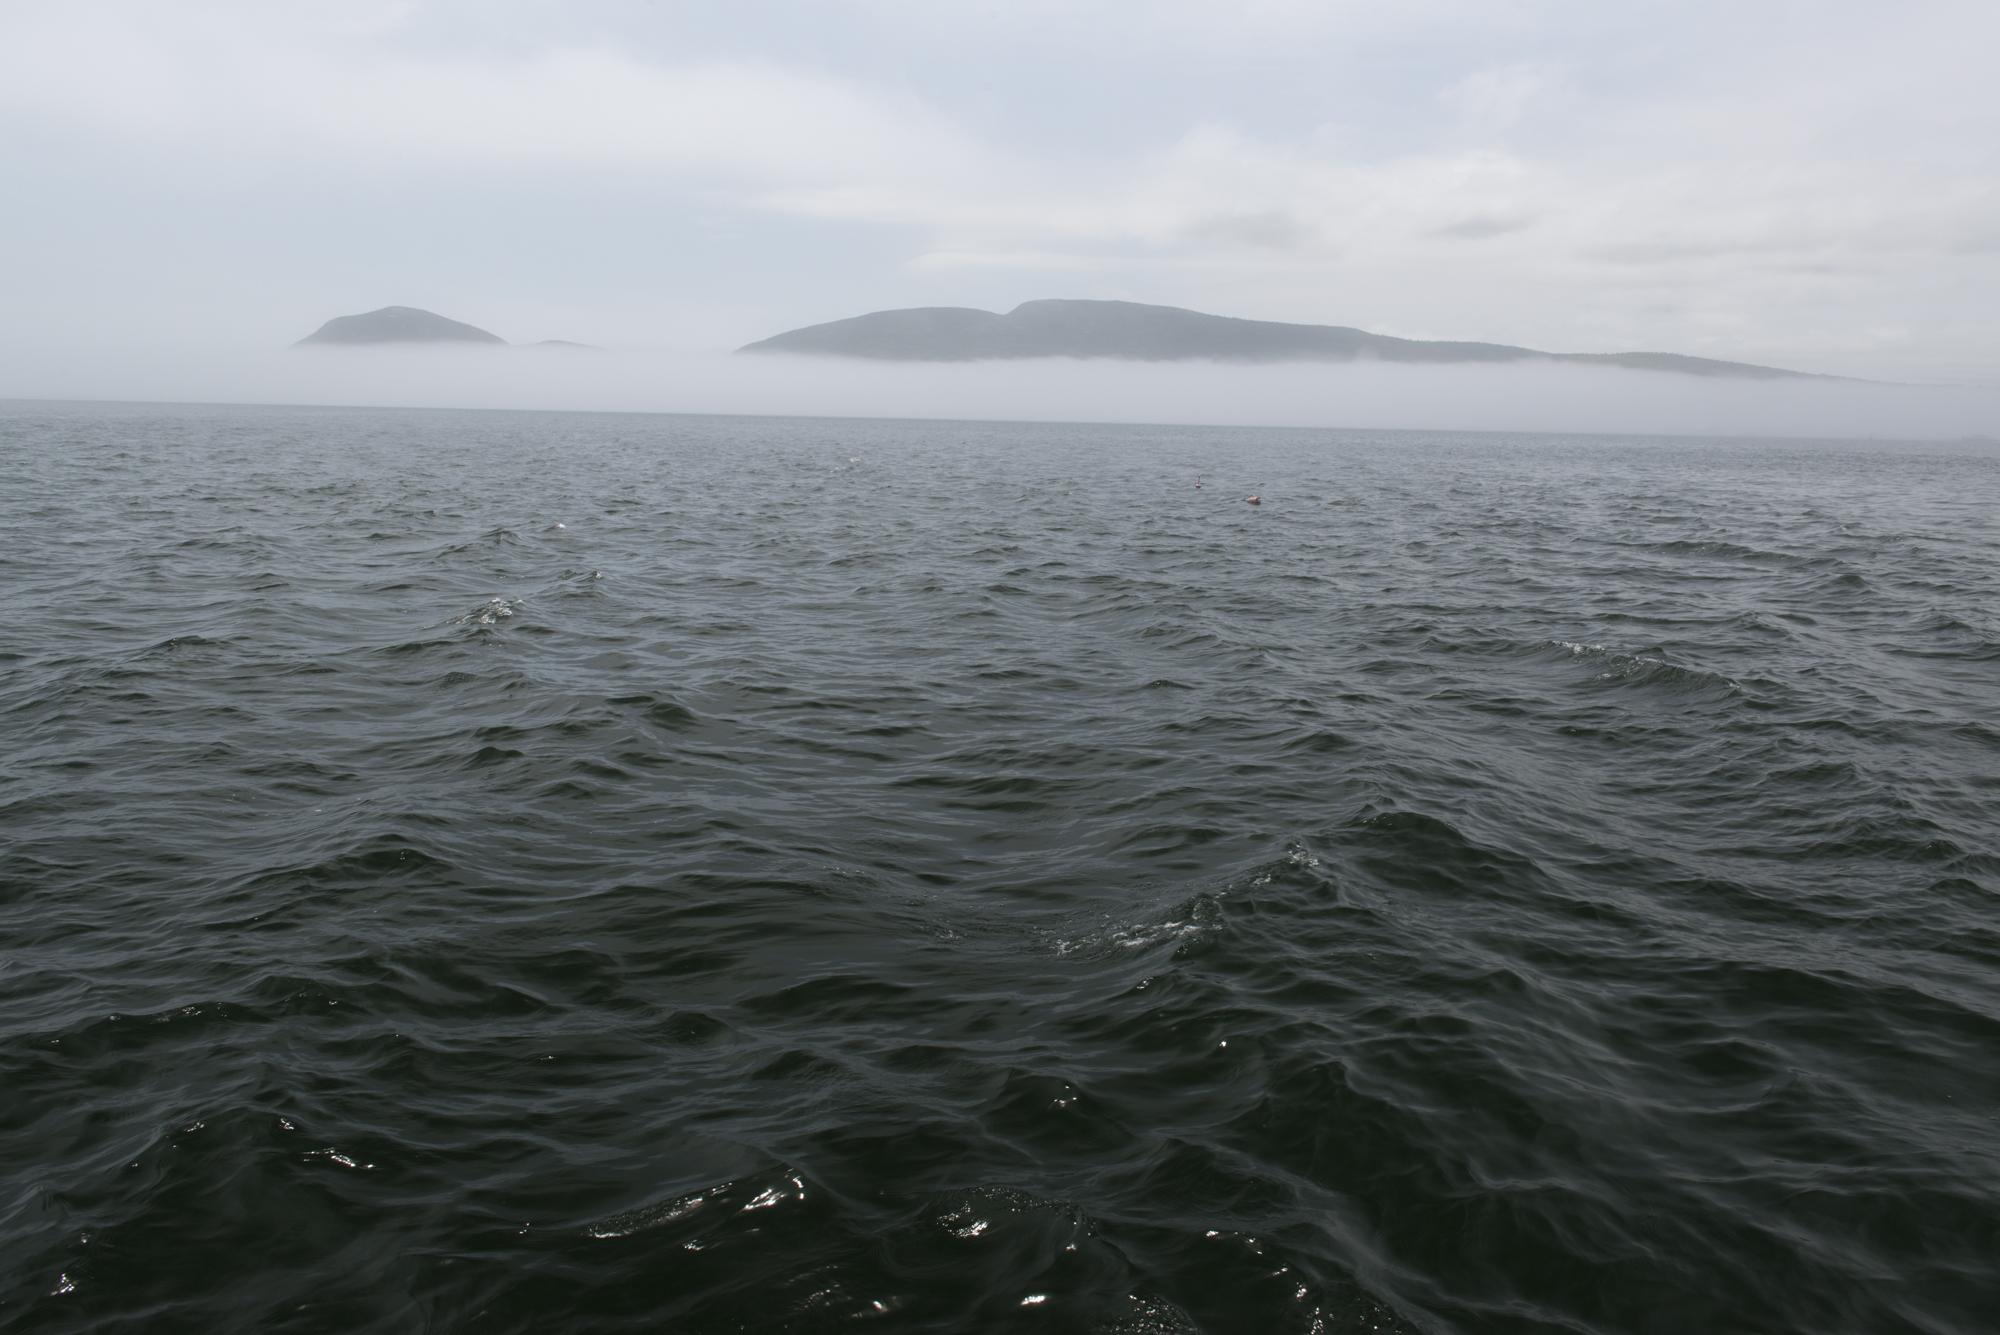 Bar Harbor Fog Bank, original image